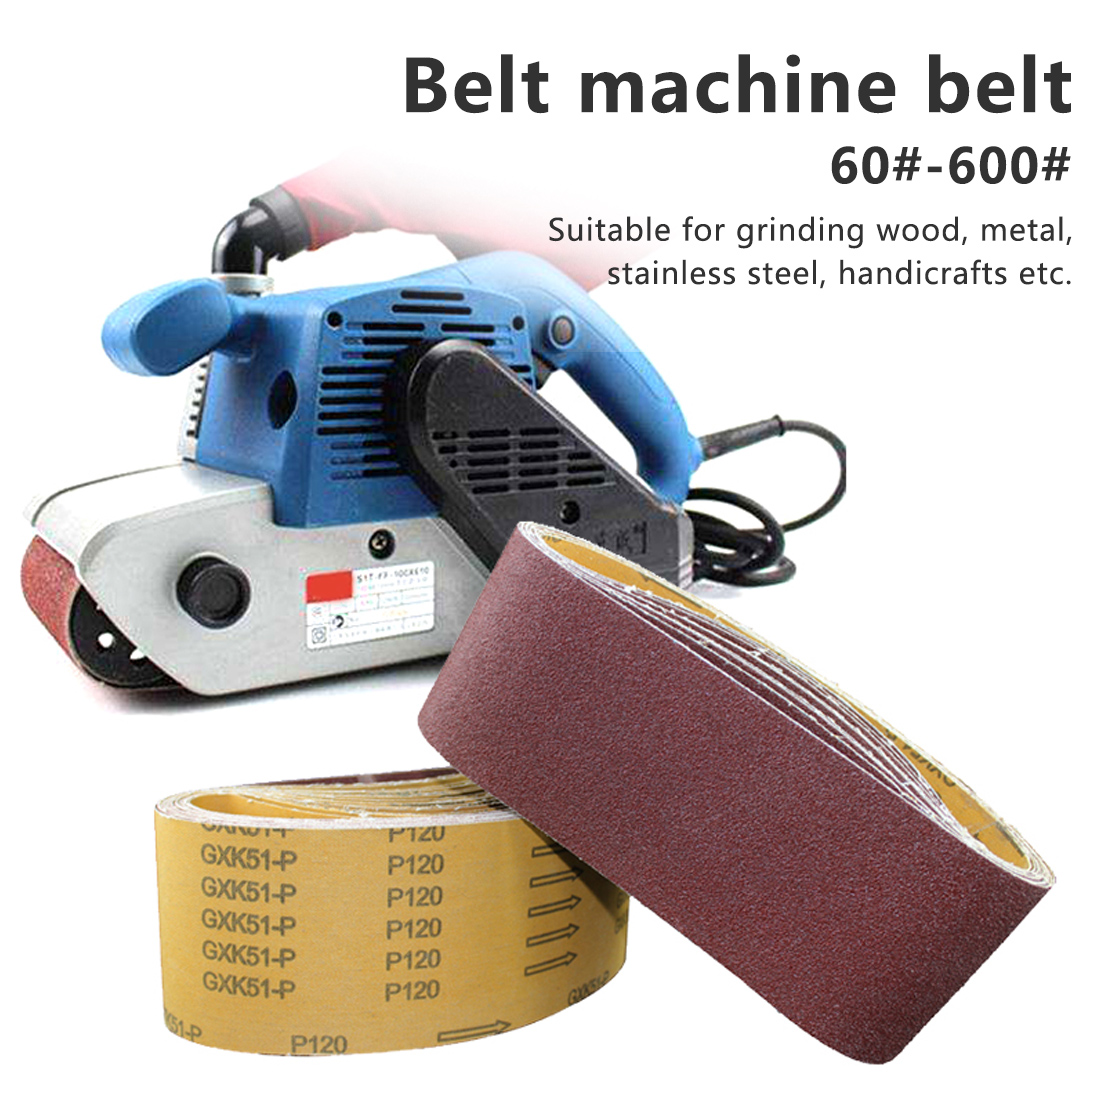 Sanding Belts Abrasive Sanding Screen Band For Wood Soft Metal Grinding Polishing P60 - P600 Grinding Polish Grinding Polis